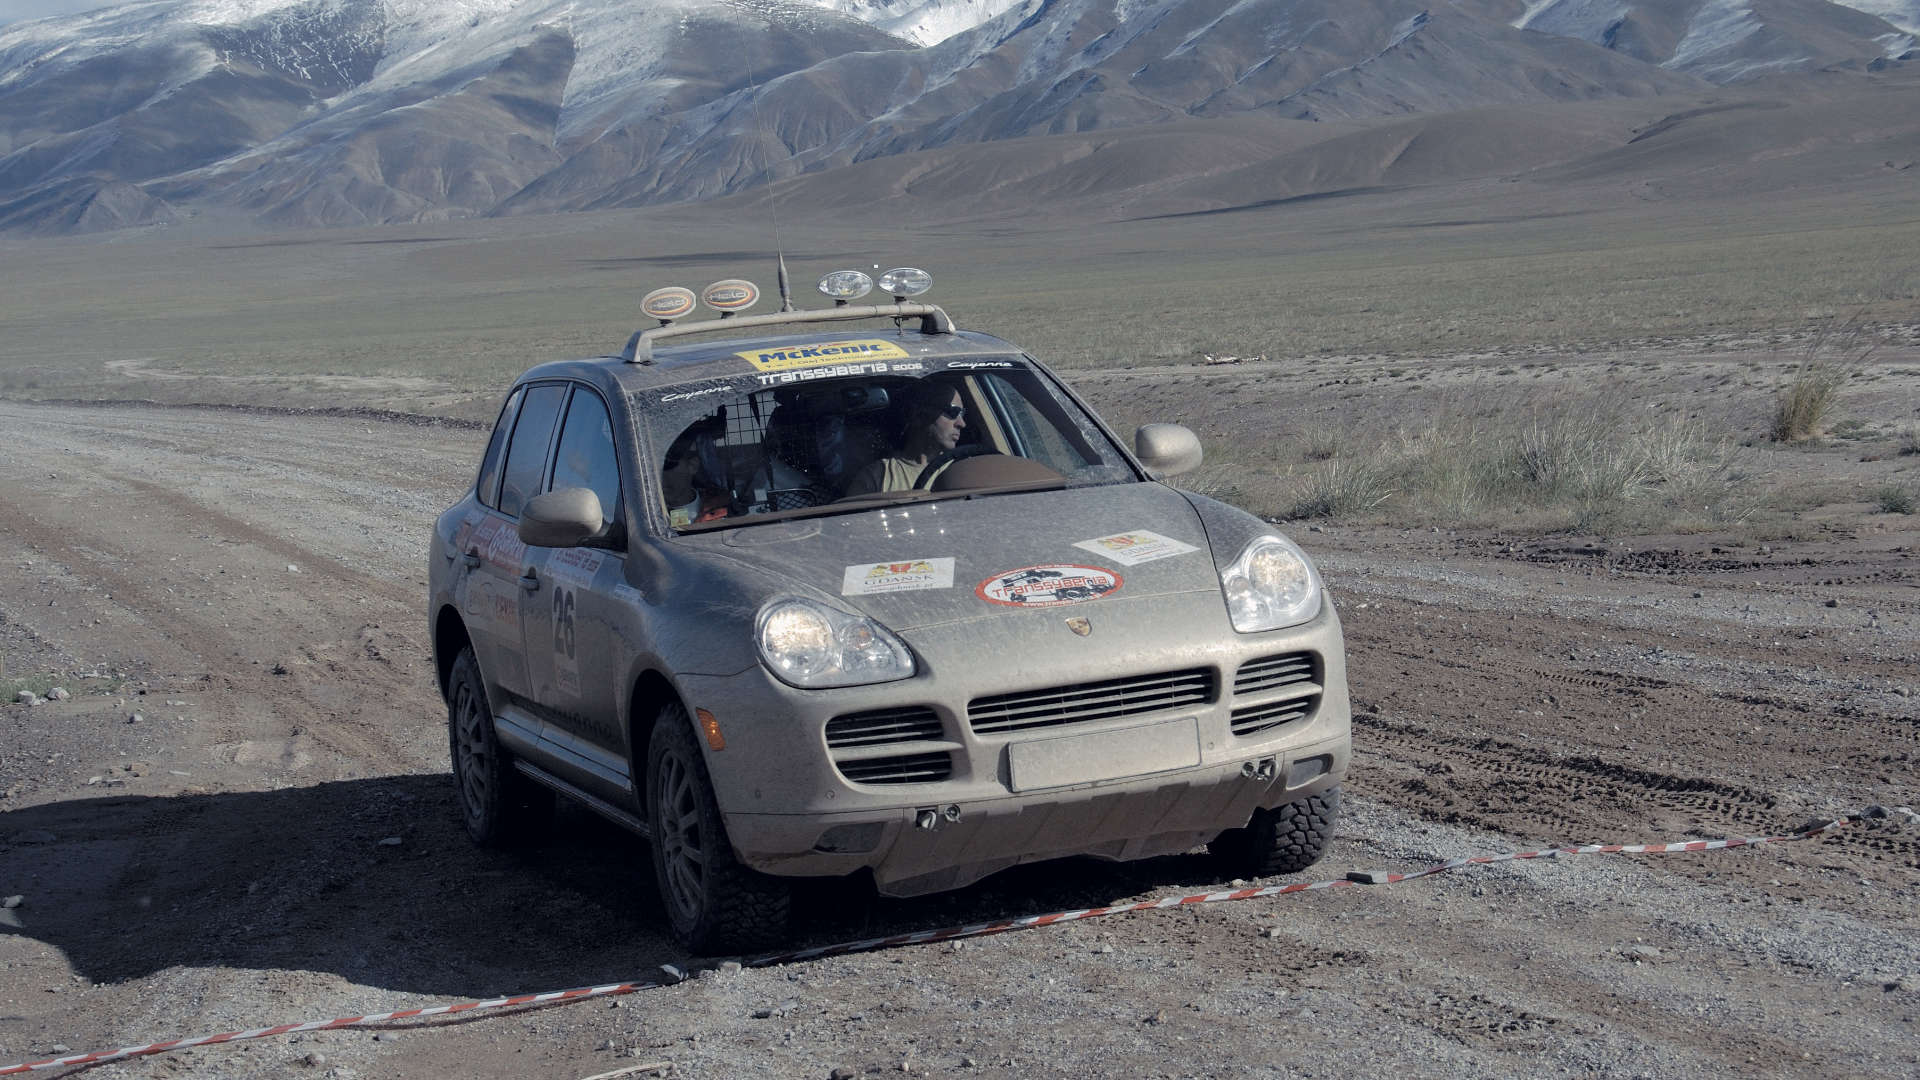 Porsche Cayenne S E1 Rallye Transsyberia 2006